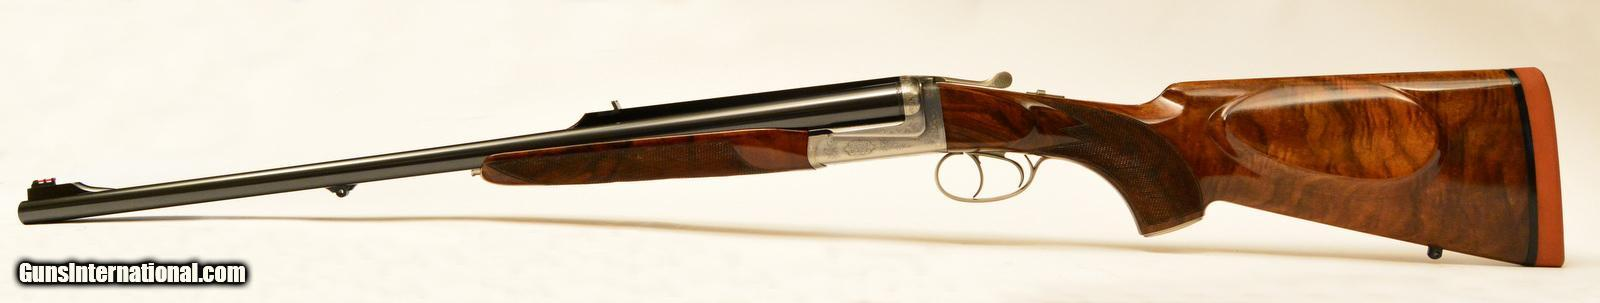 Verney Carron Double Rifle  470 NITRO!!